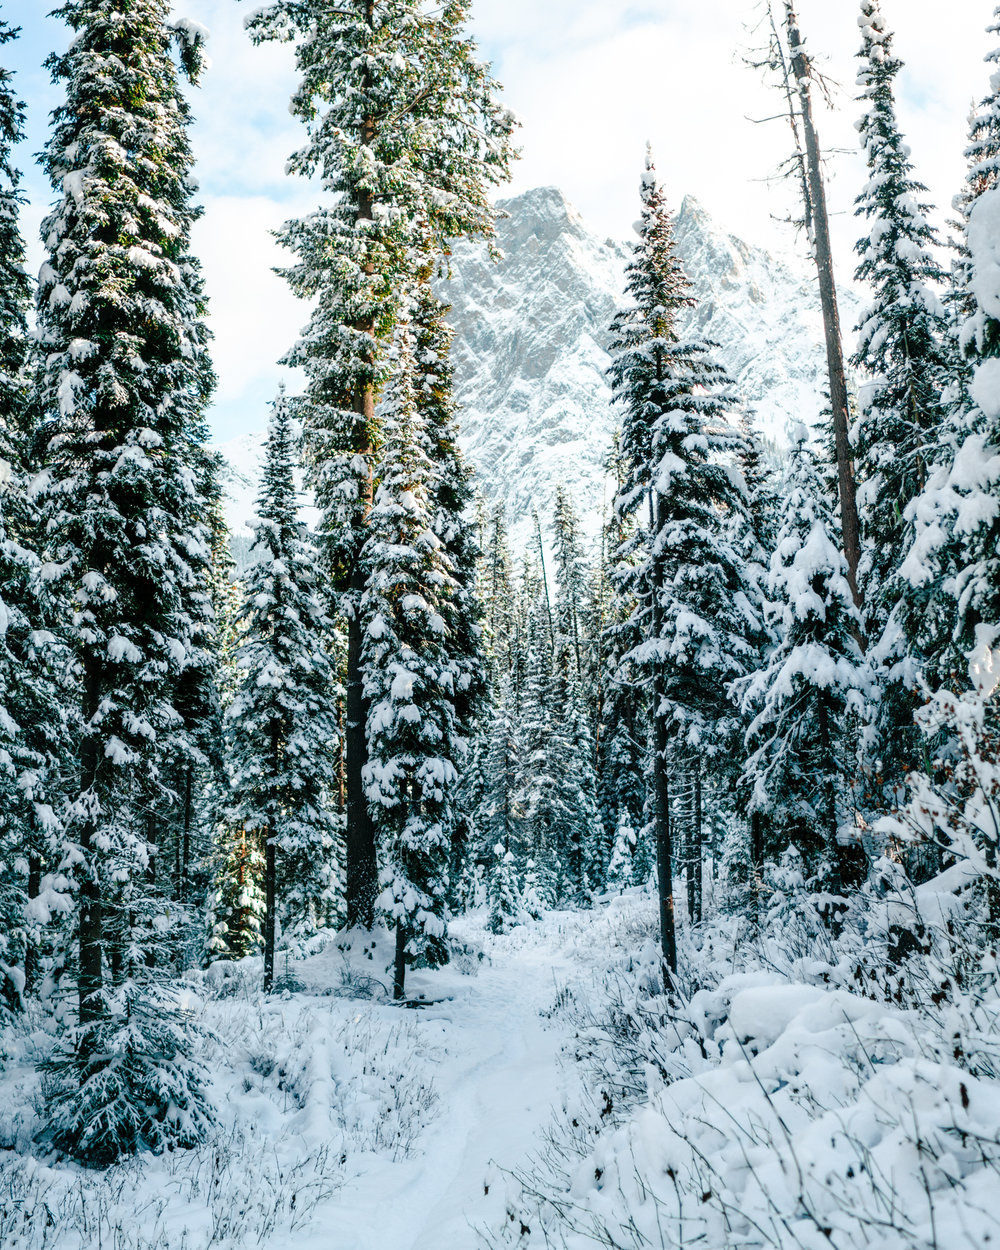 Winter in Banff National Park